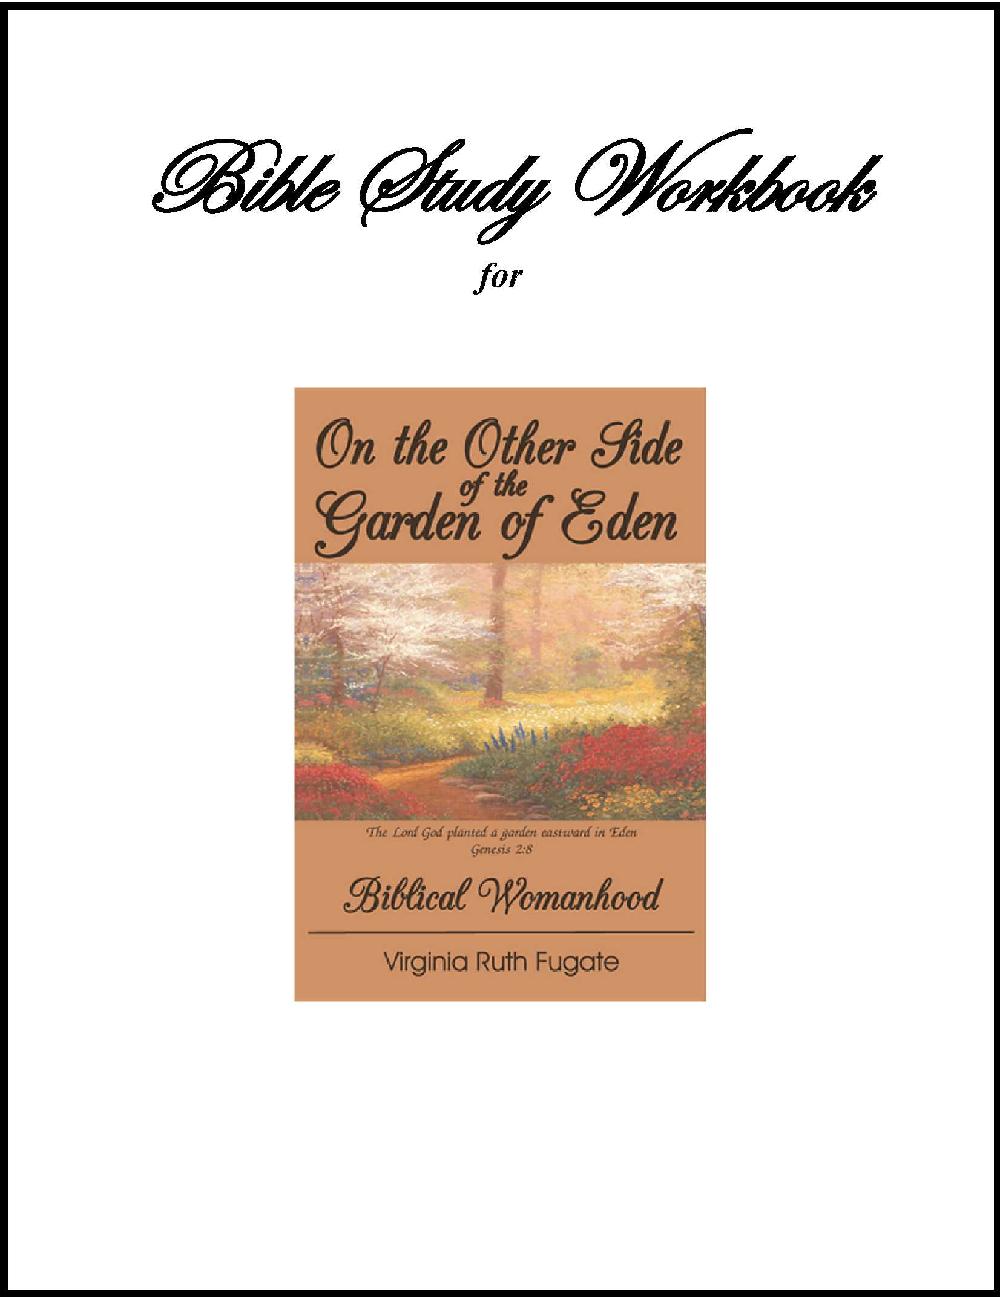 Workbooks christian workbooks for women : Biblical Womanhood | Foundation for Biblical Research